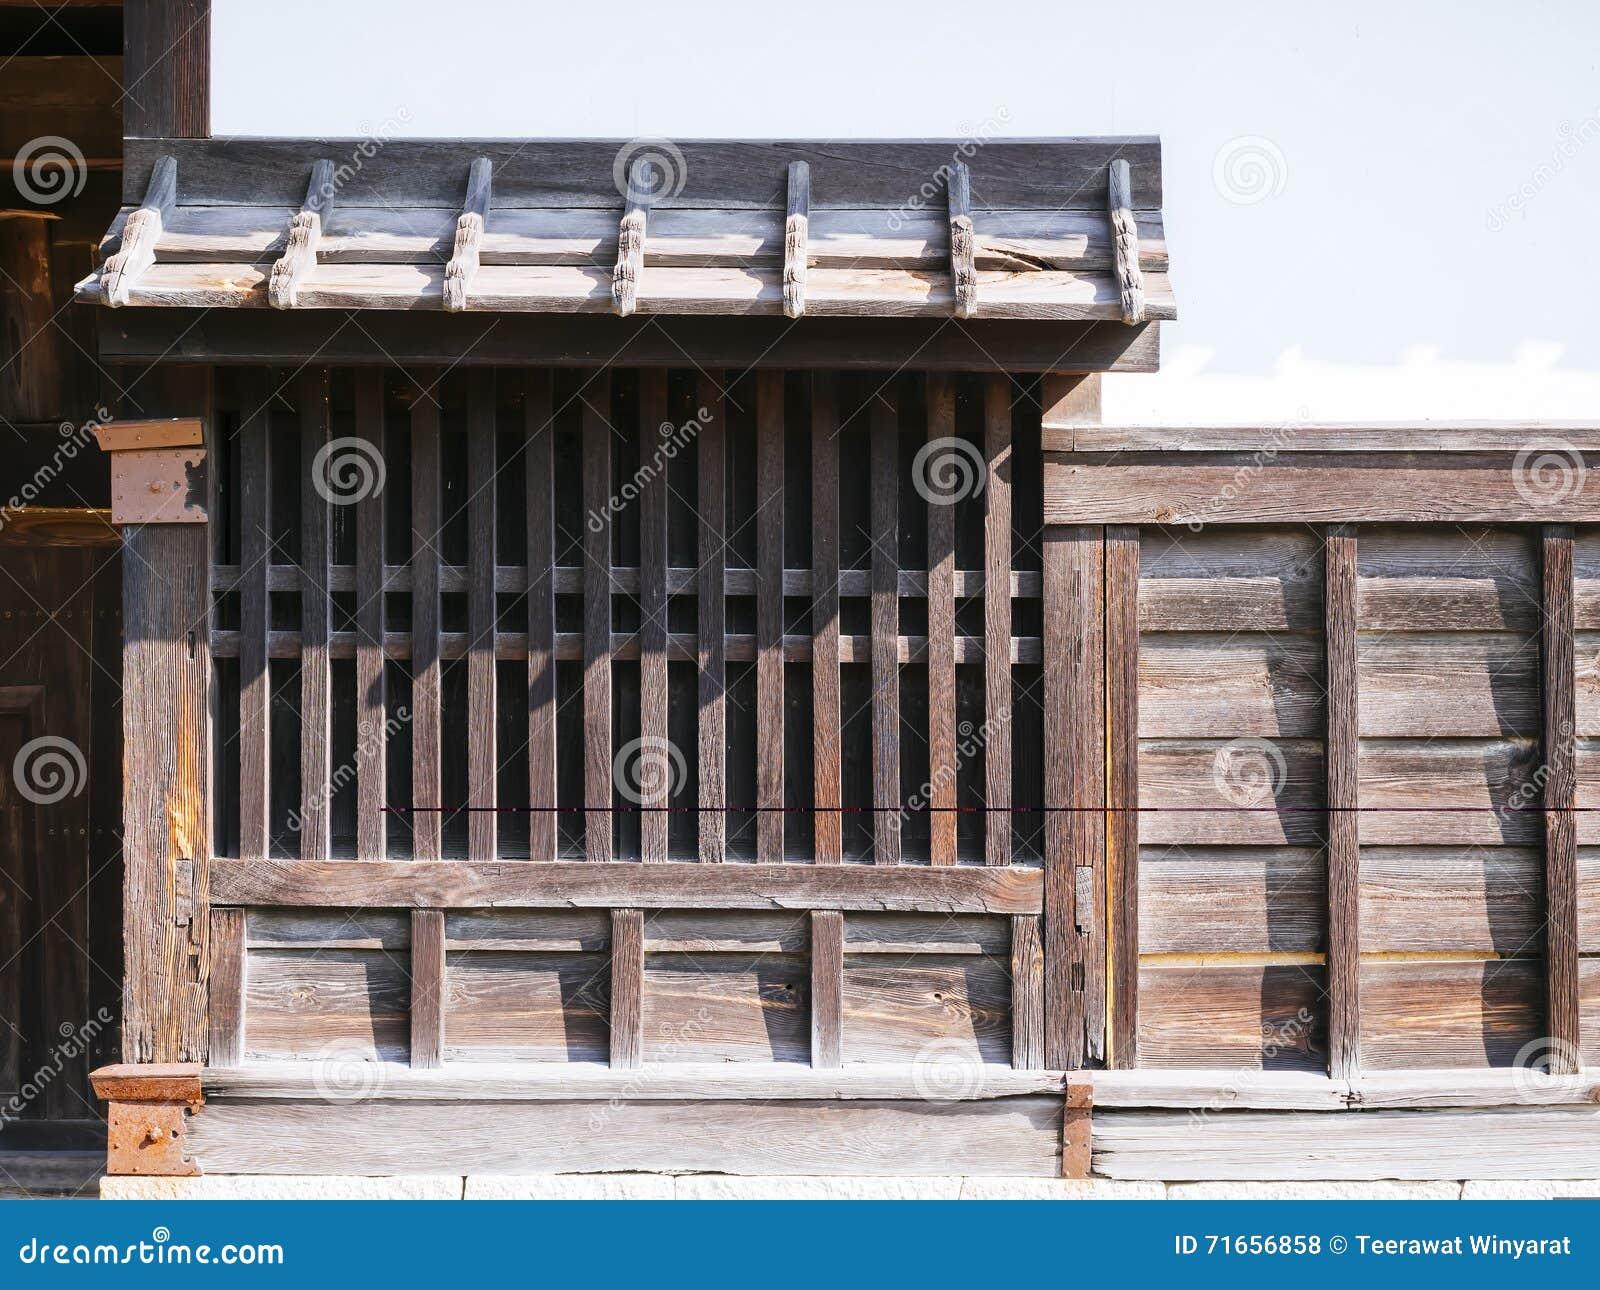 9b8715ae43d5 Η ιαπωνική αρχιτεκτονική παράδοσης απαριθμεί το ξύλινο παράθυρο Στοκ ...